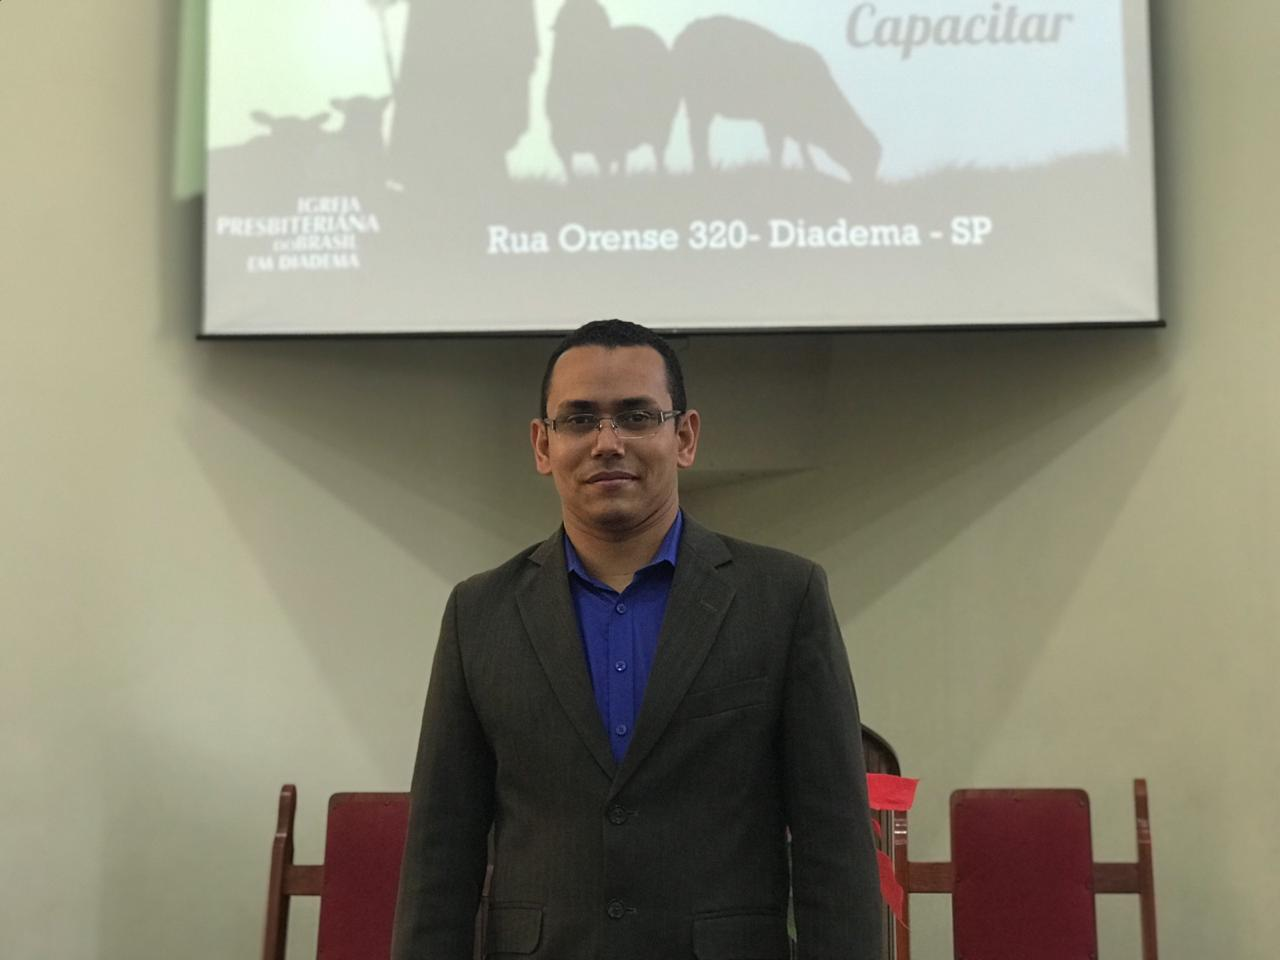 Rev. Leandro Rocha dos Santos (pastor efetivo da IPD desde 2016)